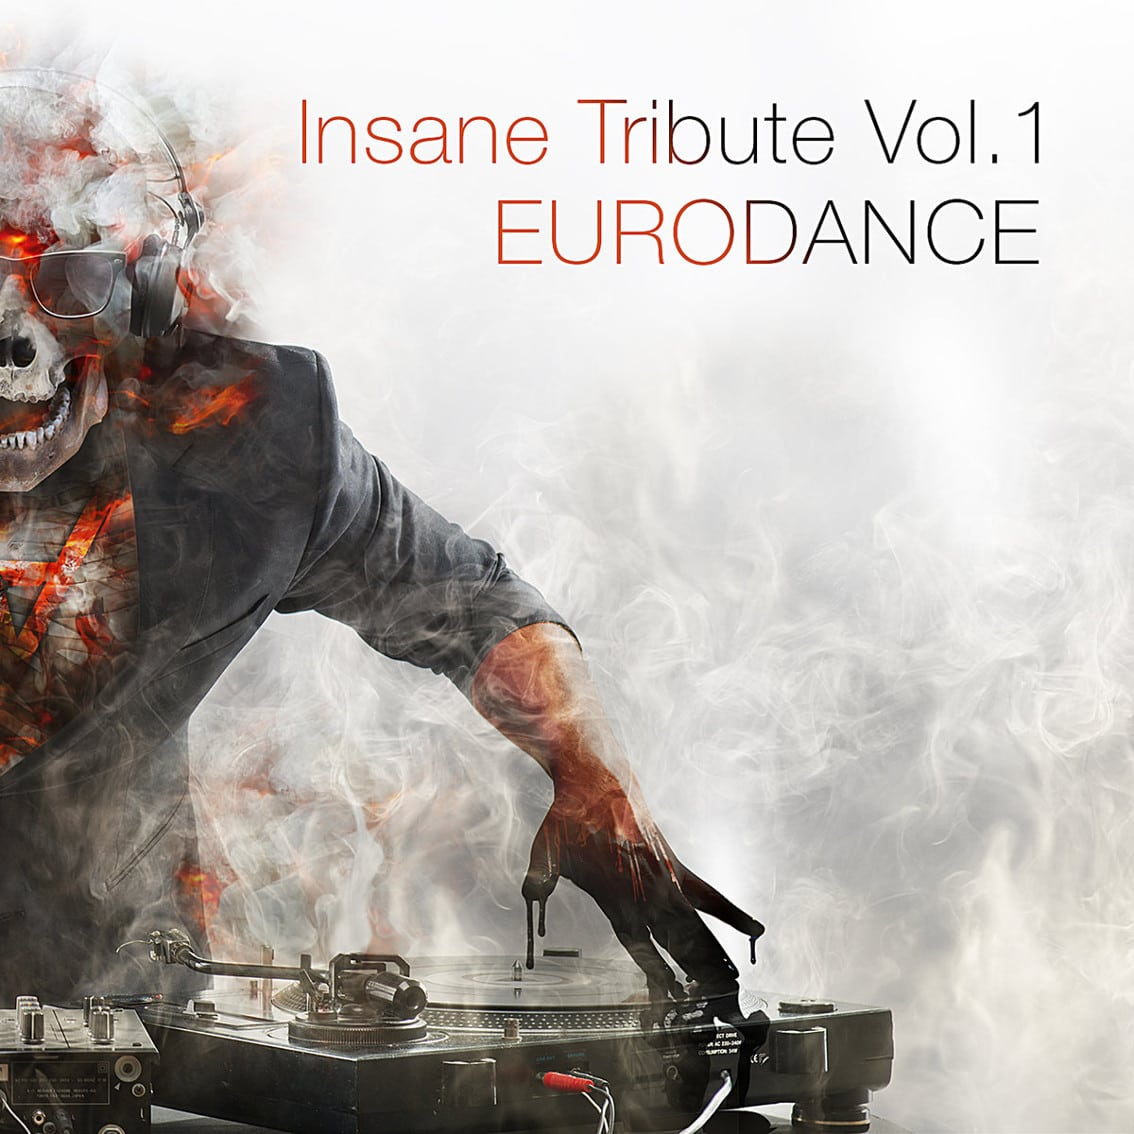 Insane Records launches'Insane Tribute Vol.1 EURODANCE' compilation